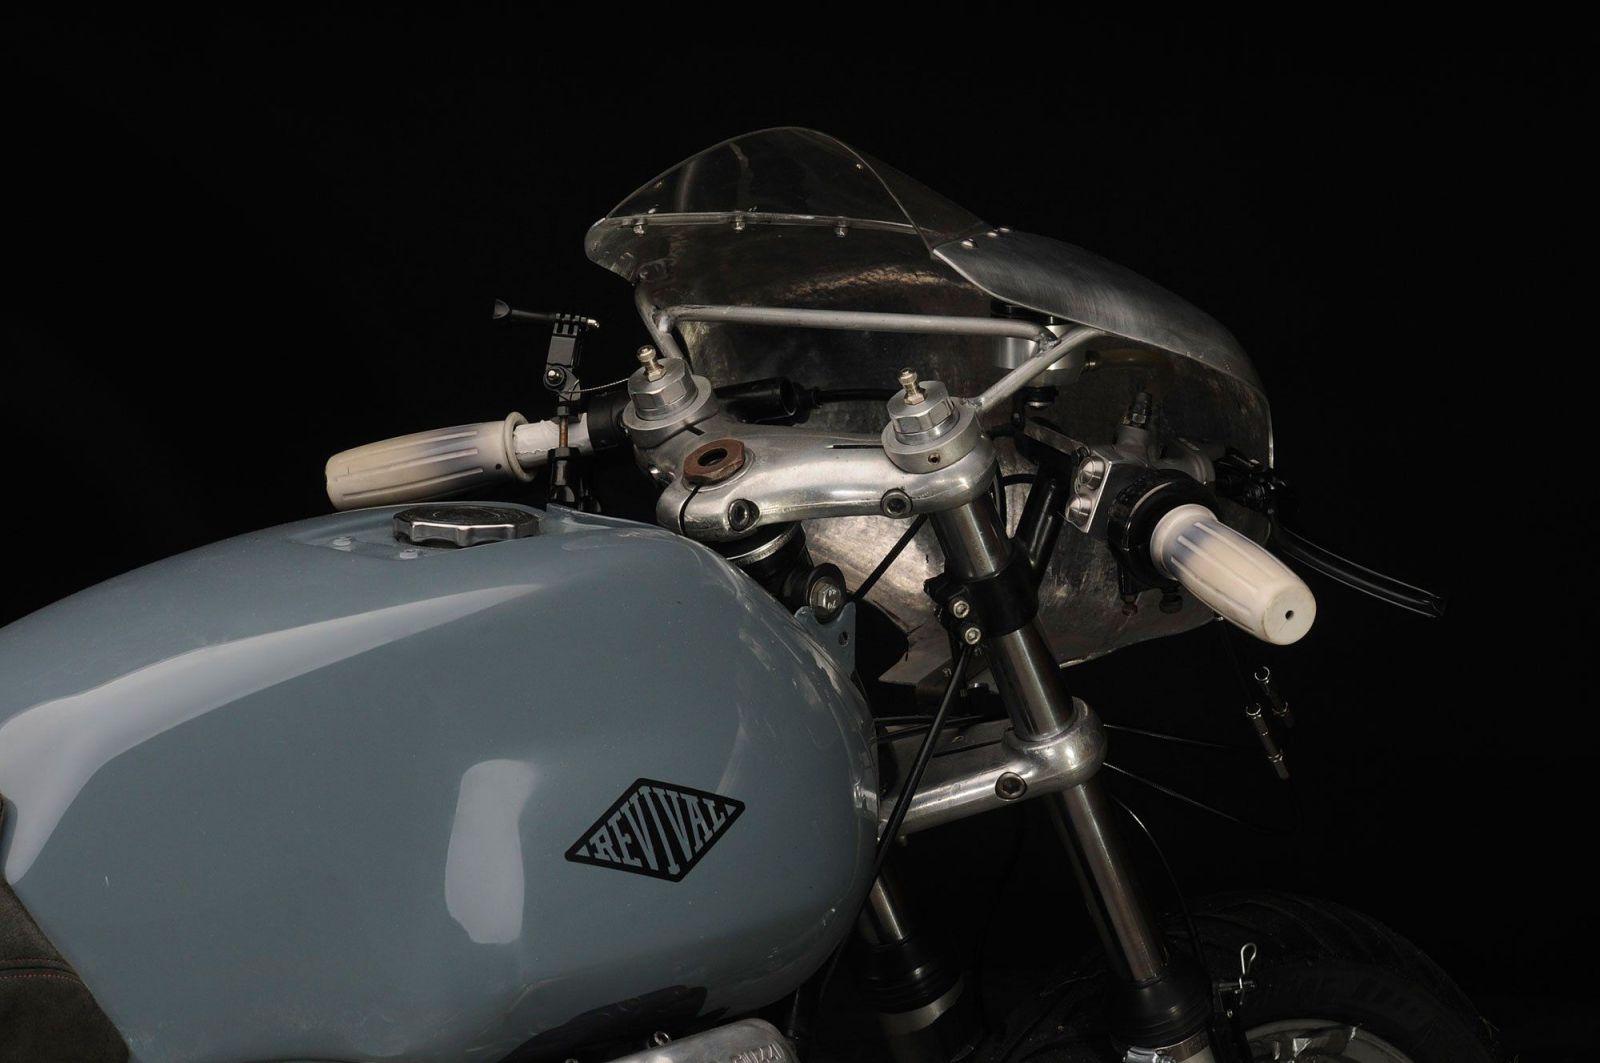 Moto Guzzi le Mans Revival Cycles